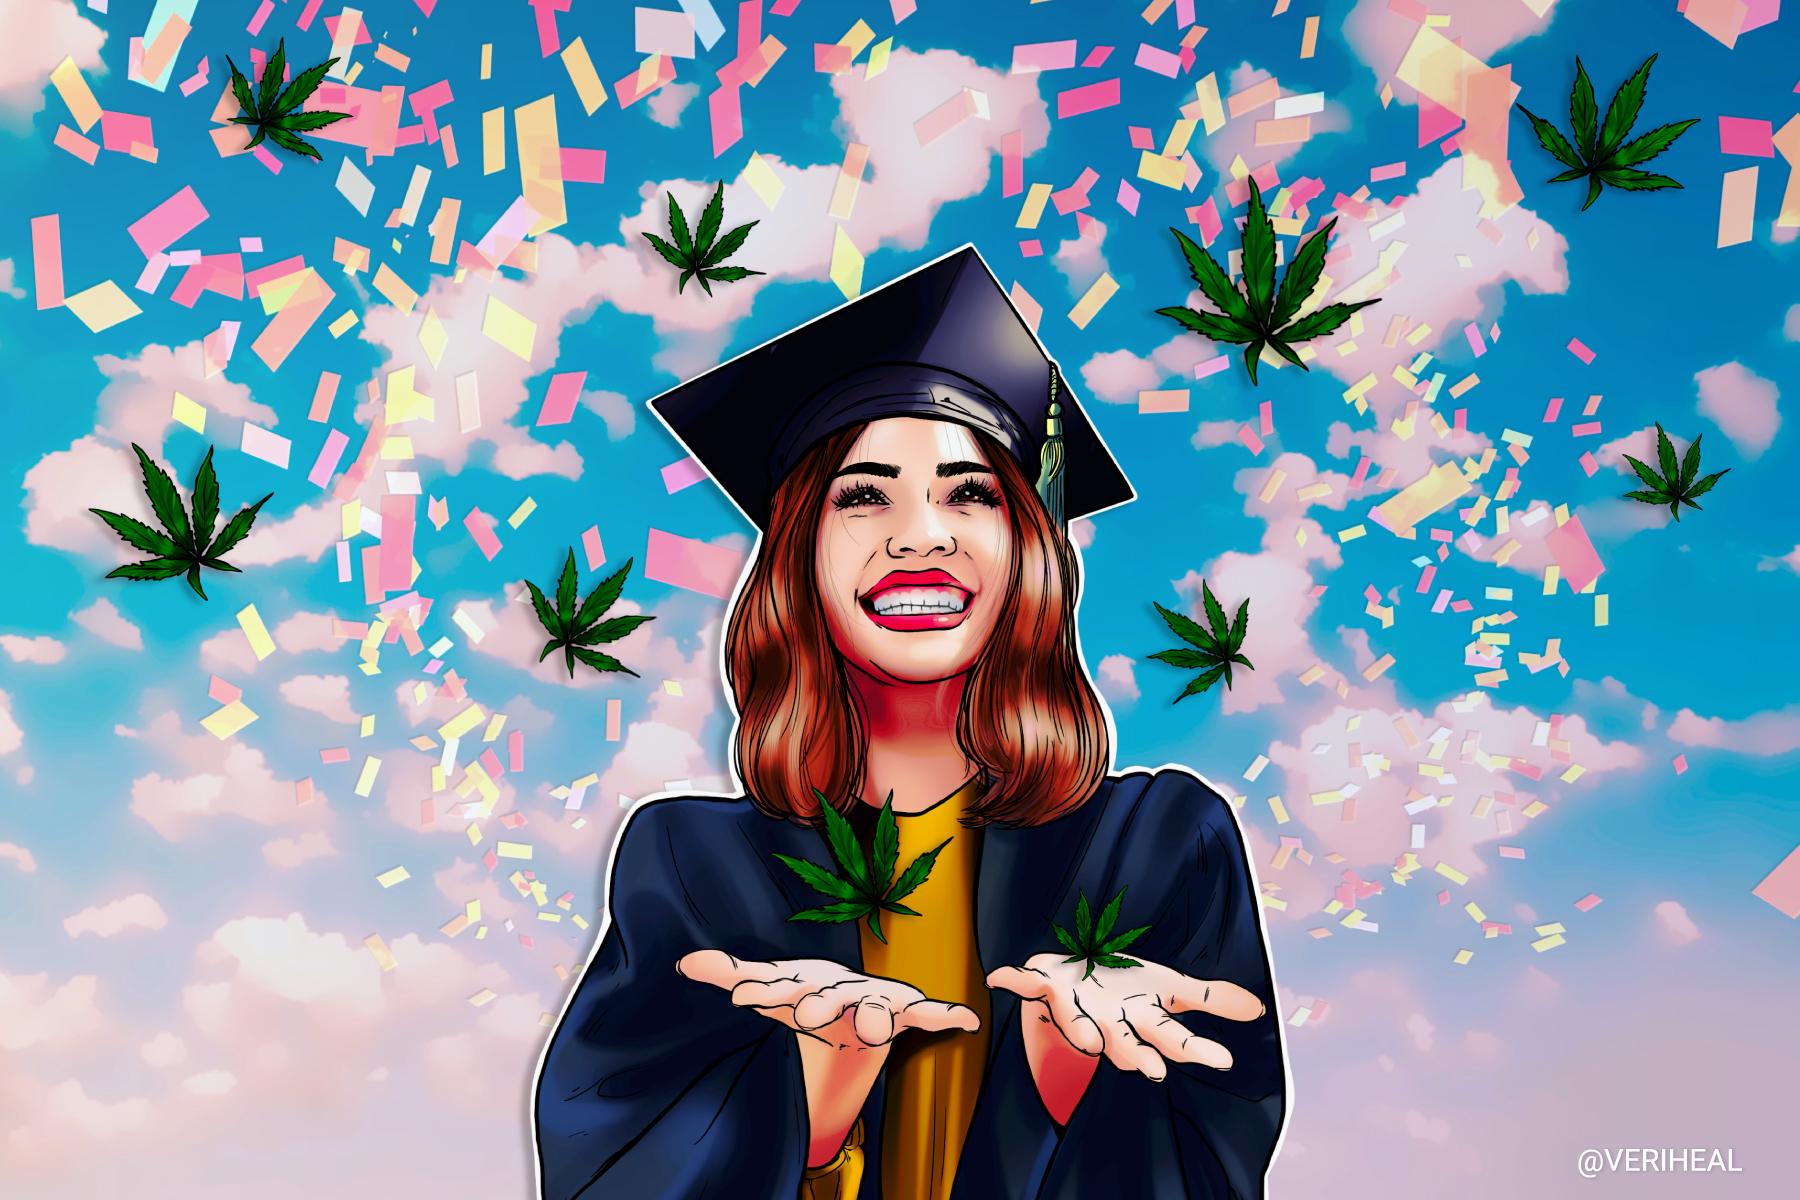 Veriheal's Innovation in Cannabis Scholarship 2021 Winners